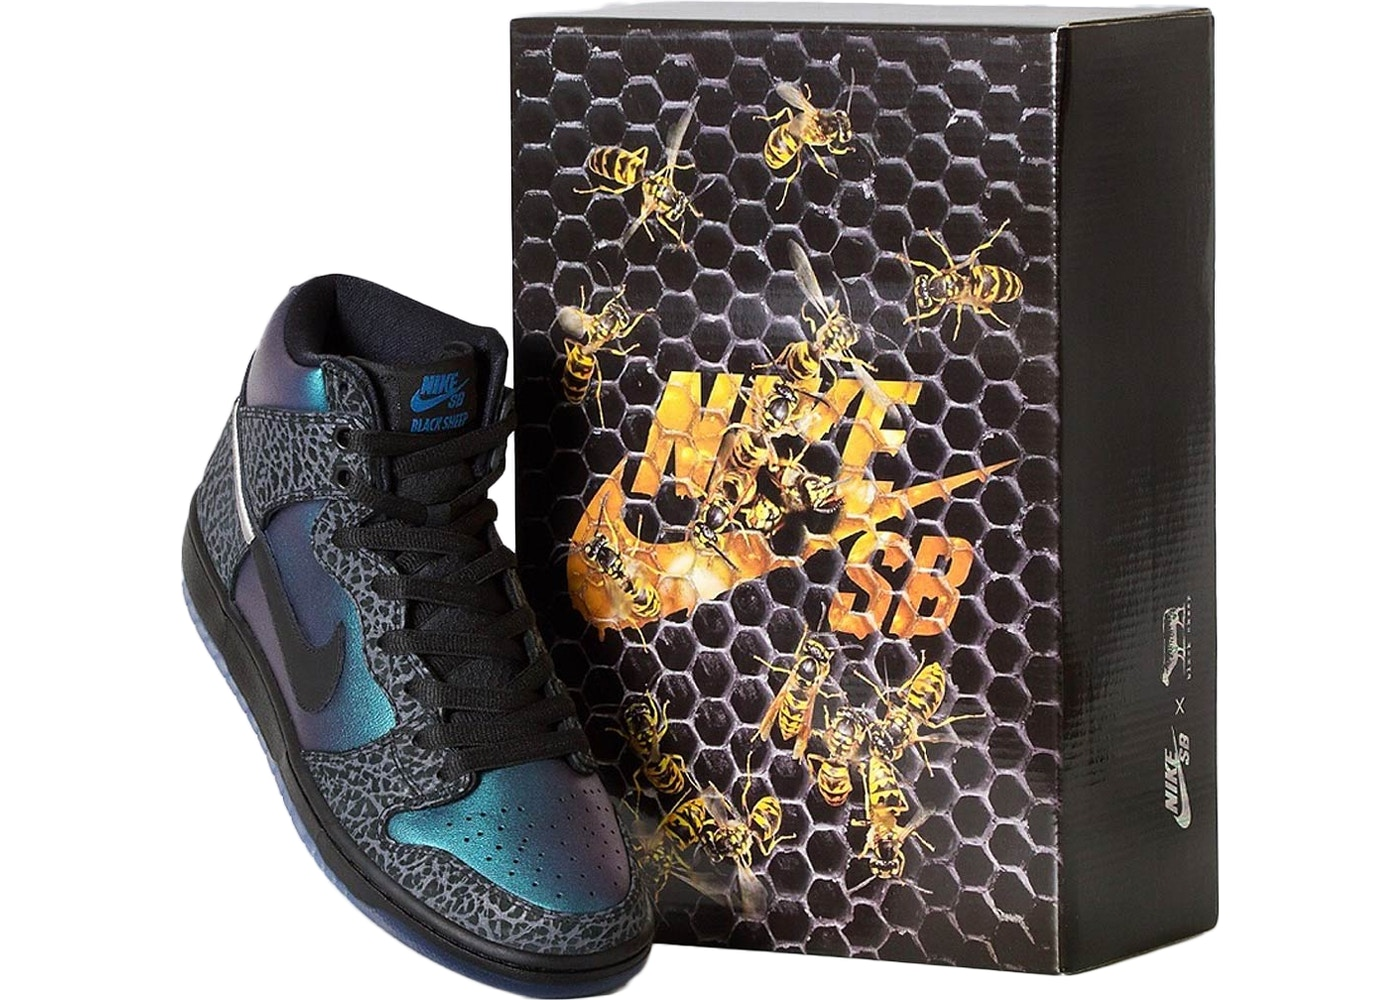 Nike SB Dunk High Black Sheep Hornet (Special Box No Accessories)